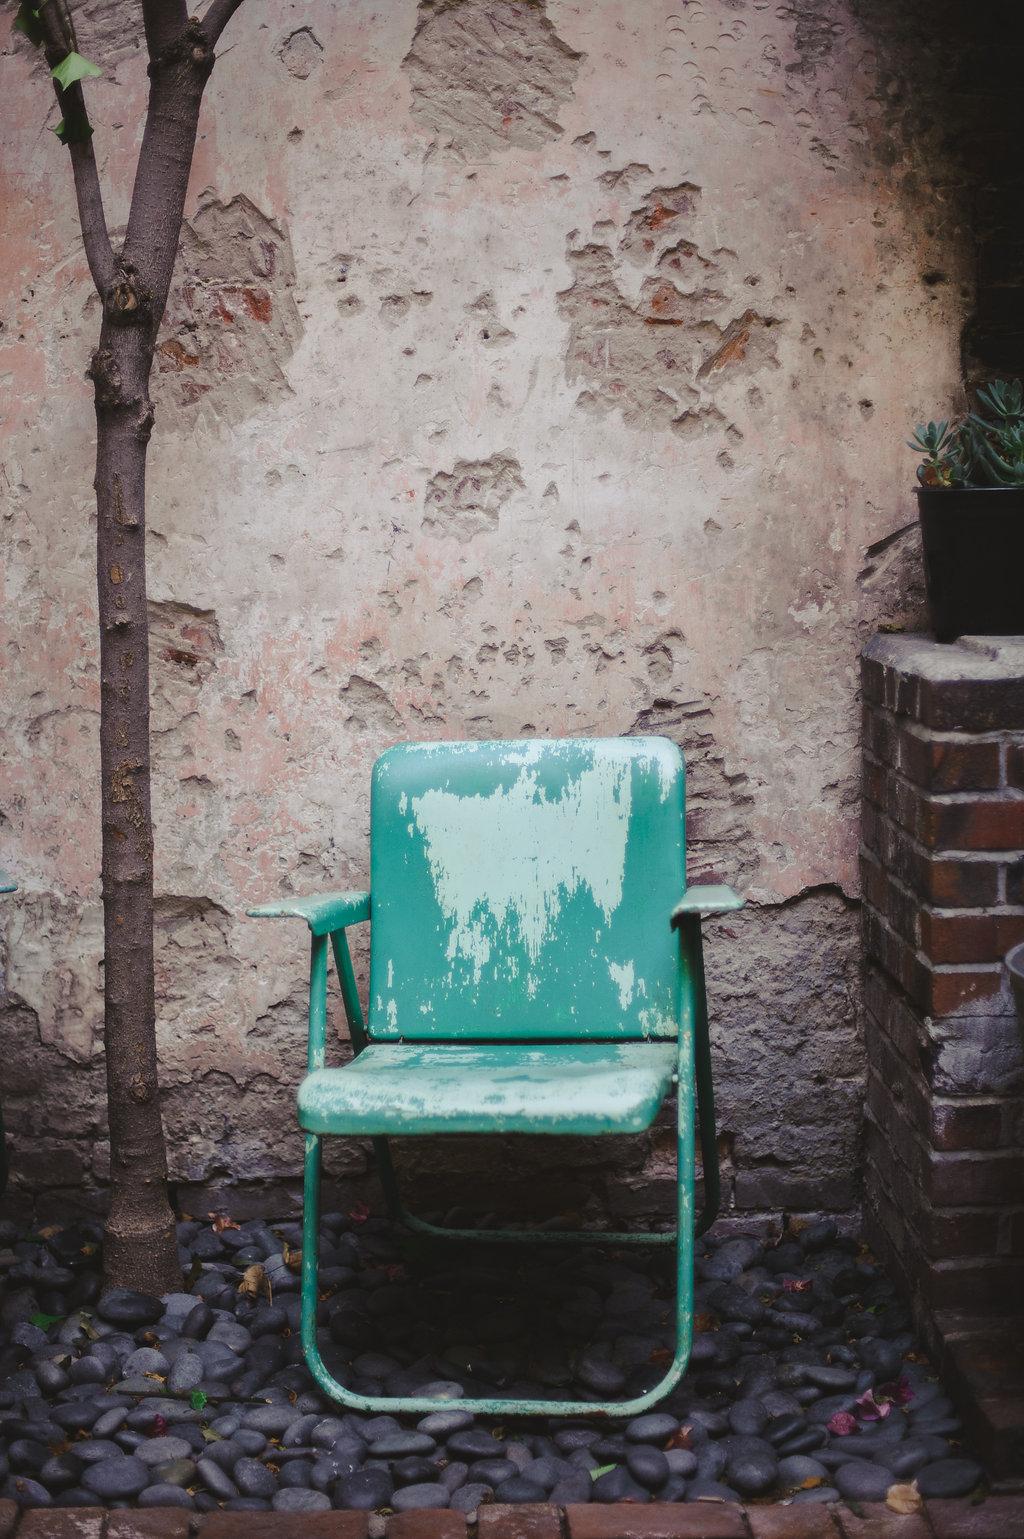 Kayla_F_Photography_Ryanne_Steele_Lifestyle-50.jpg